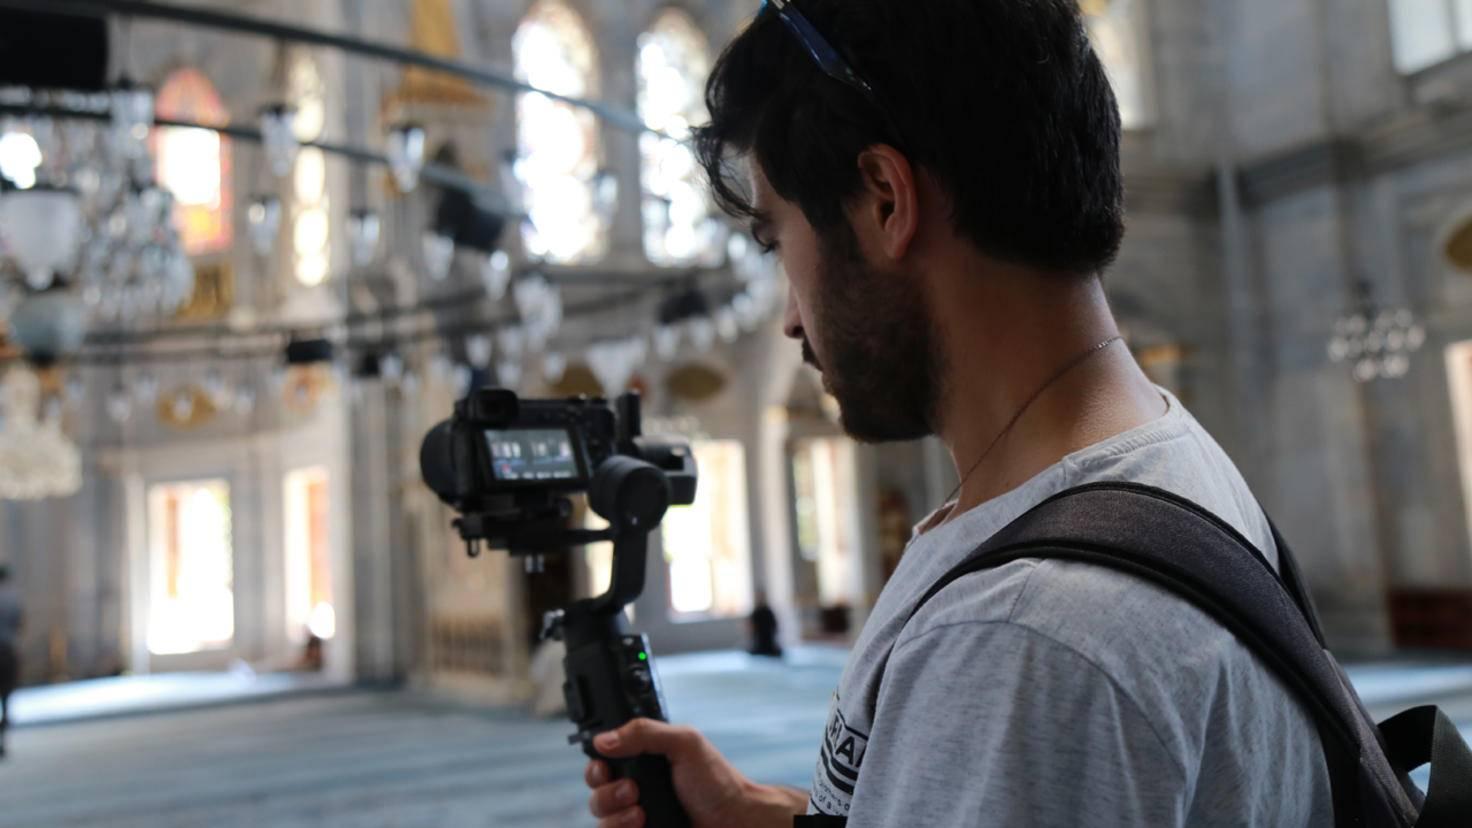 vlog-equipment-ausruestung-vlogger-zubehoer-kamera-gimbal